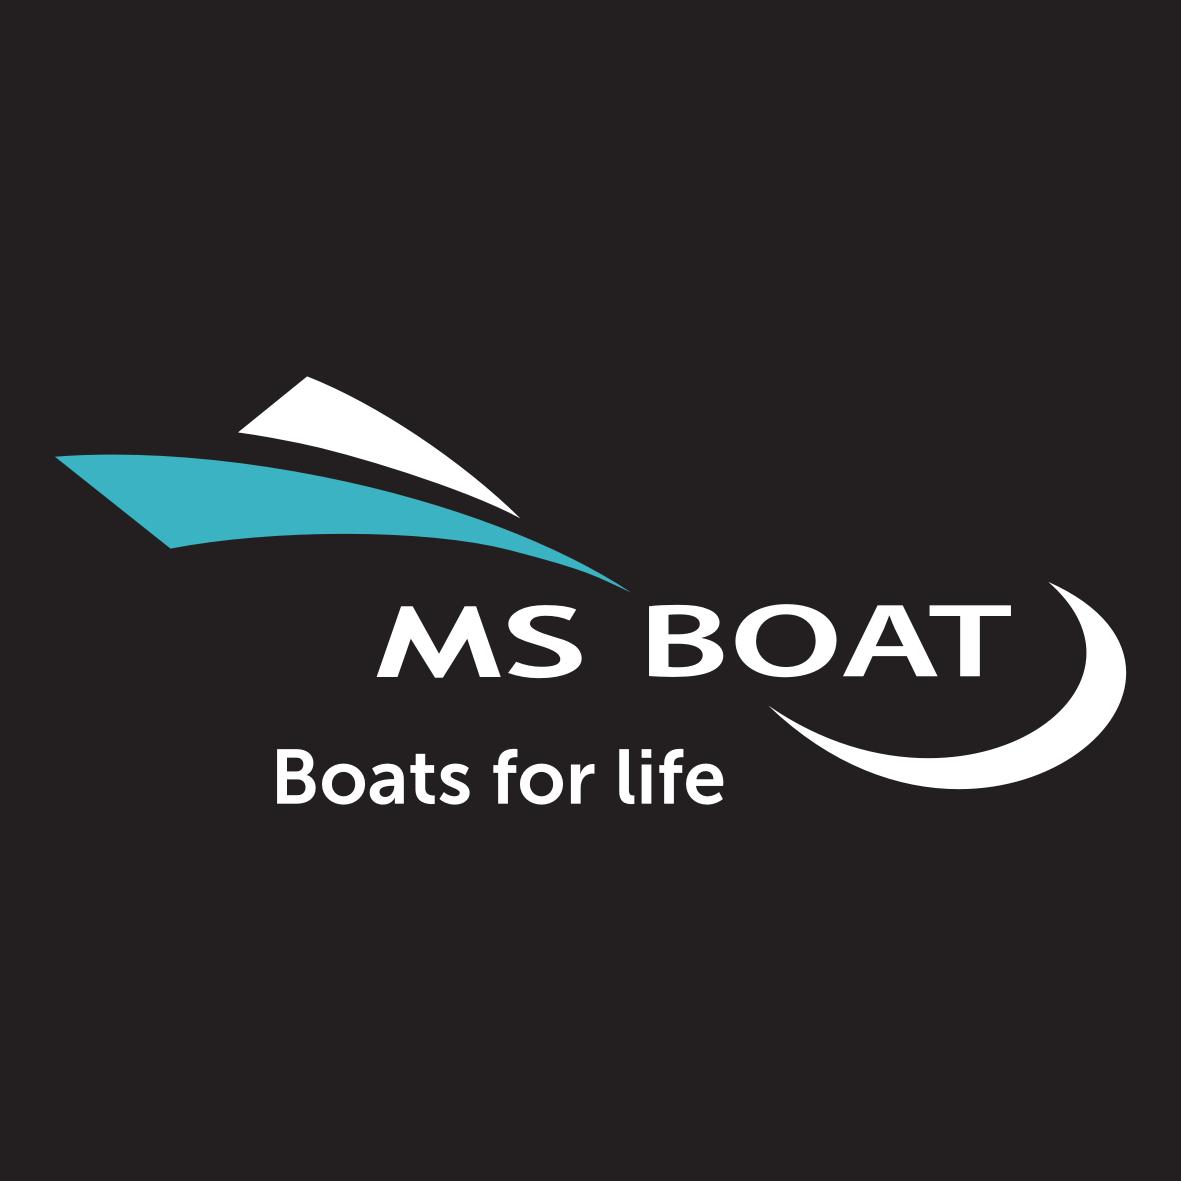 info@msboat.com